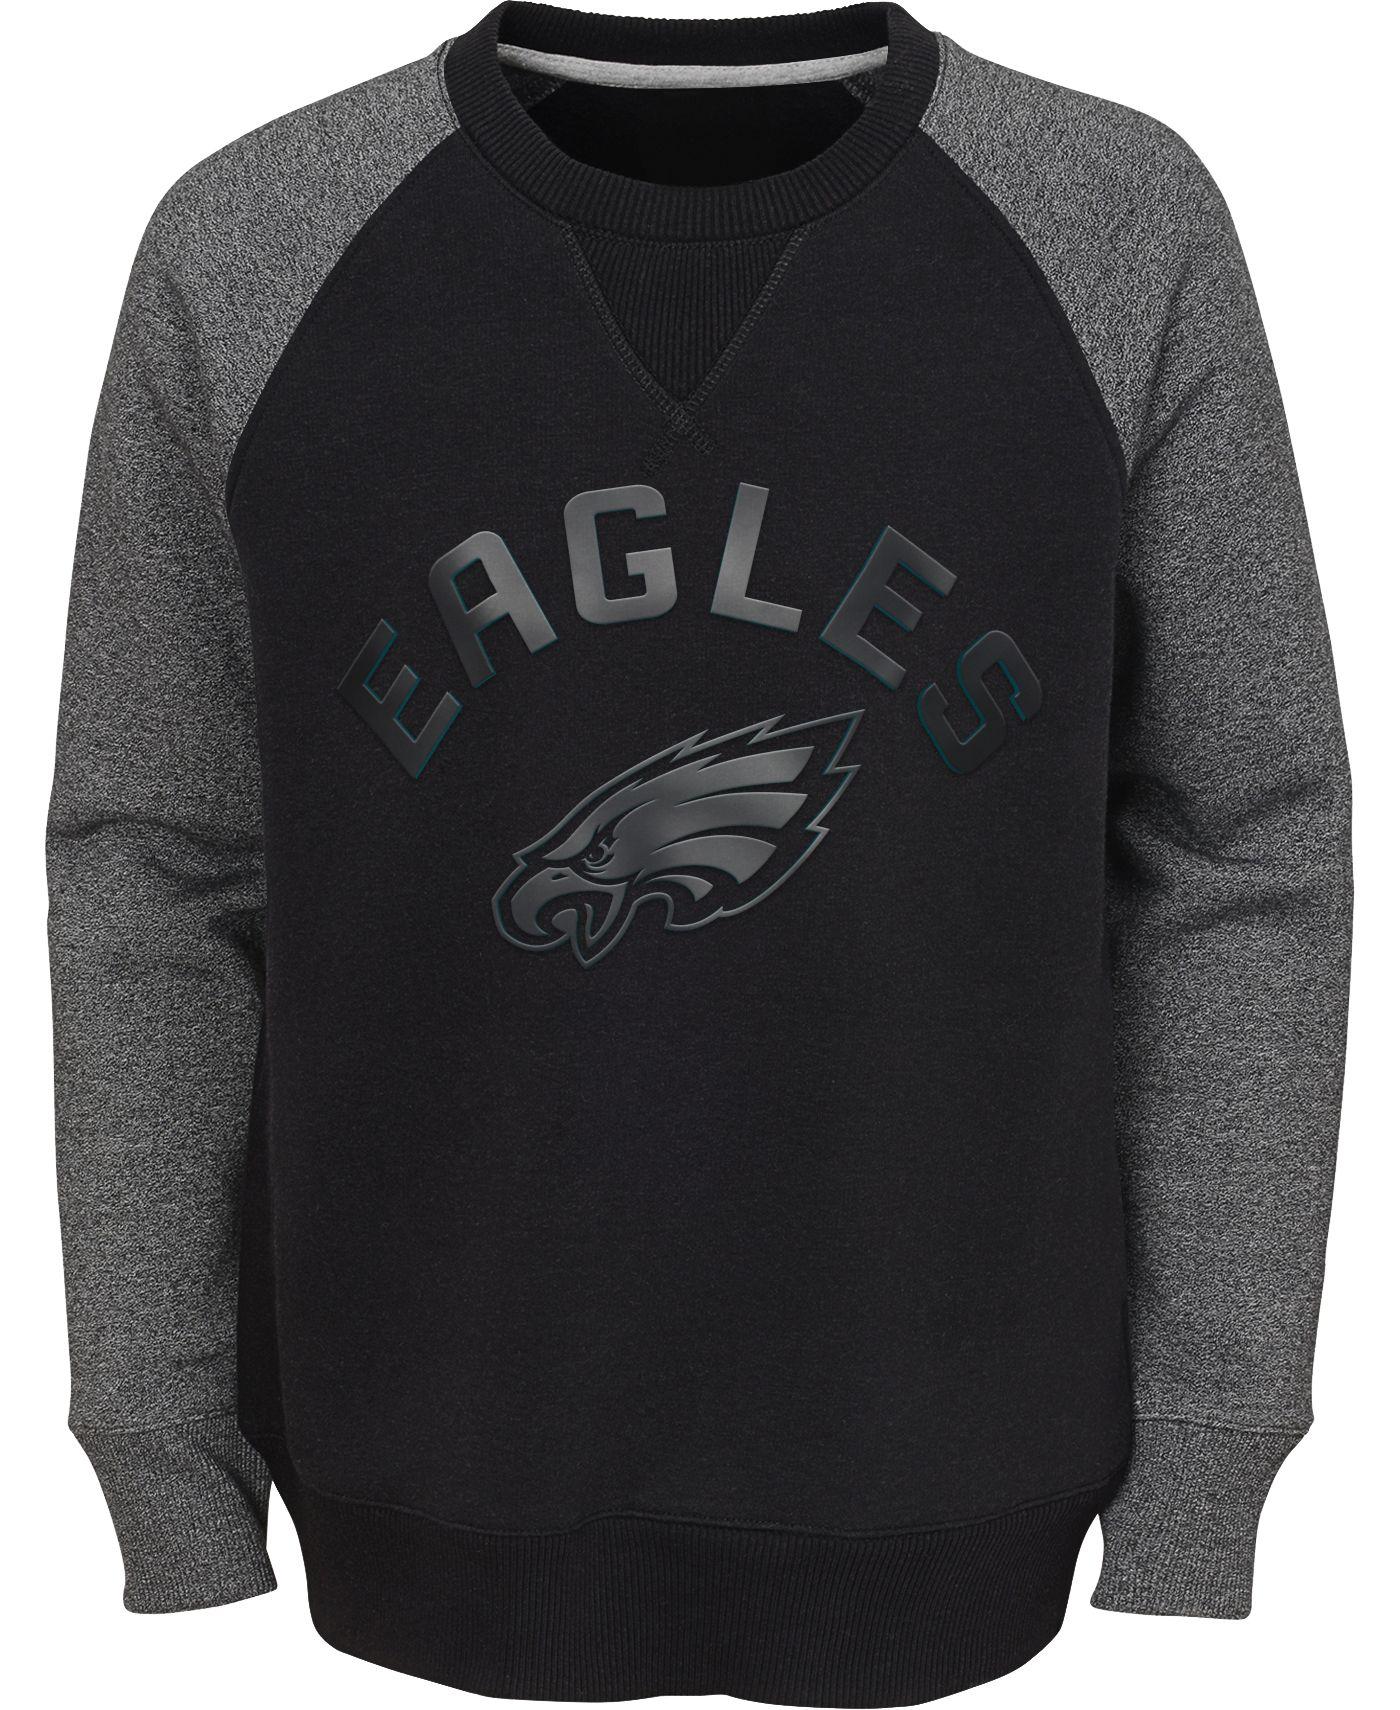 NFL Team Apparel Youth Philadelphia Eagles Raglan Fleece Black Crew